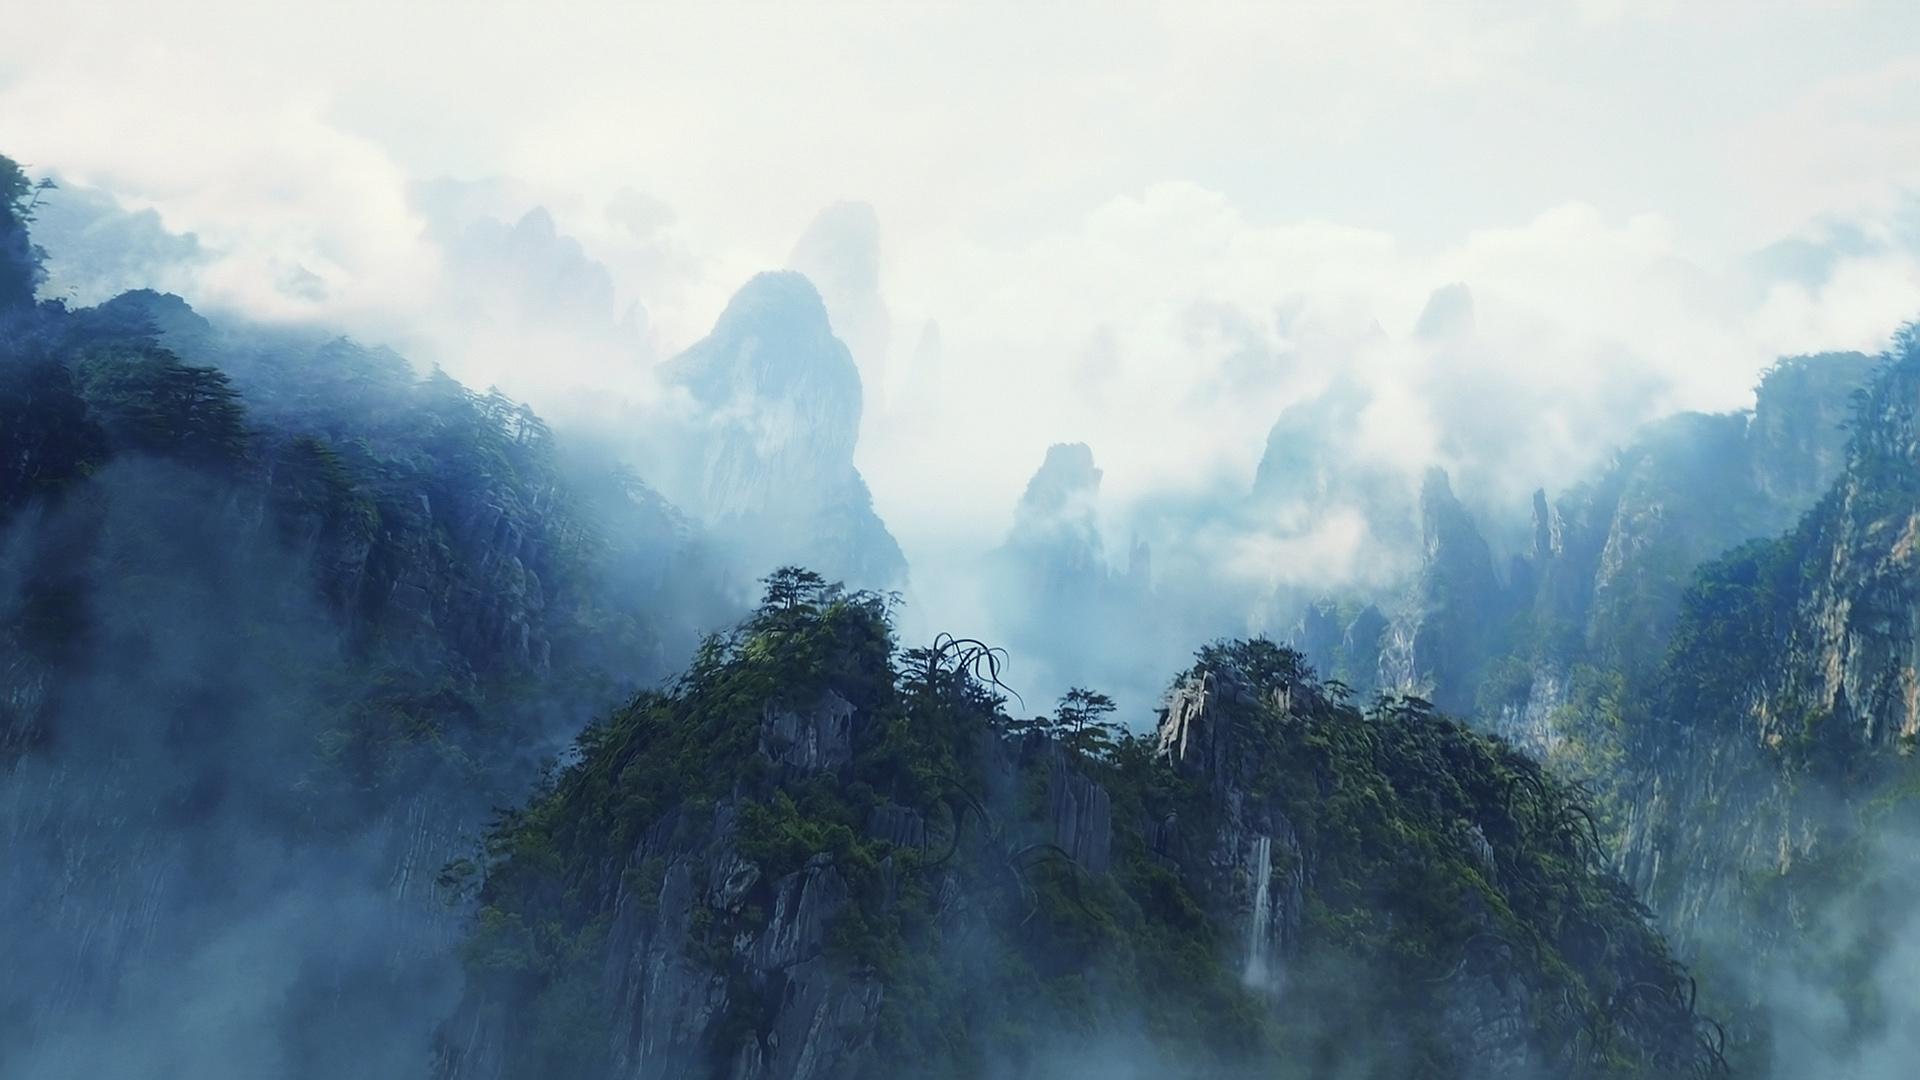 image pandoran landscape hd jpg avatar wiki fandom powered by